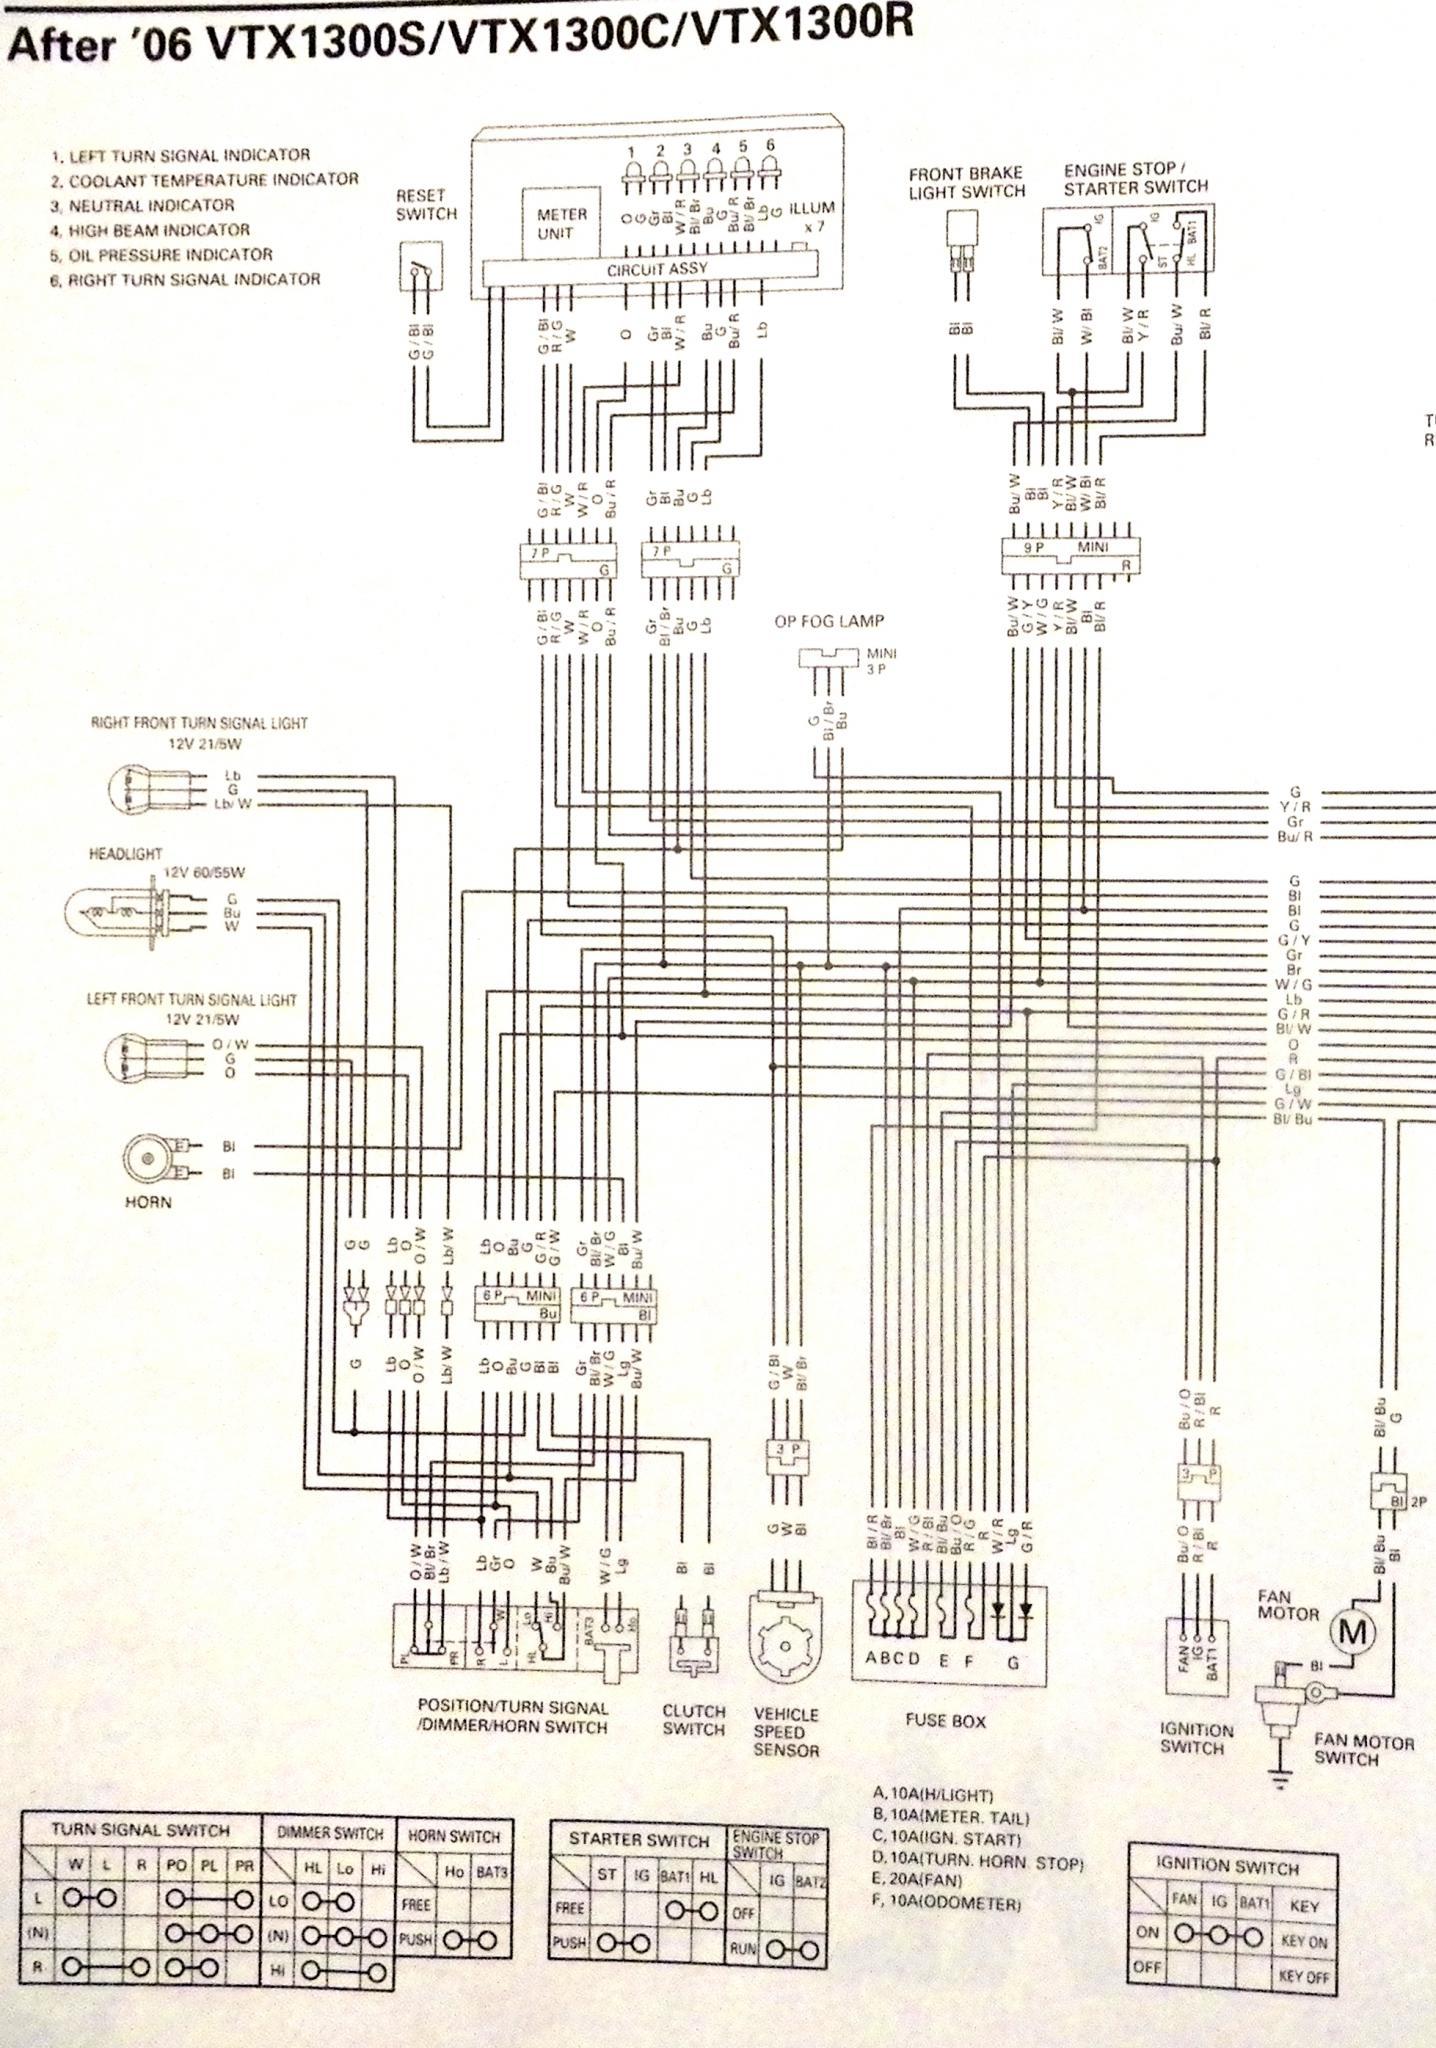 06 1300 R Wiring Schematic | Honda VTX ForumHonda VTX Forum